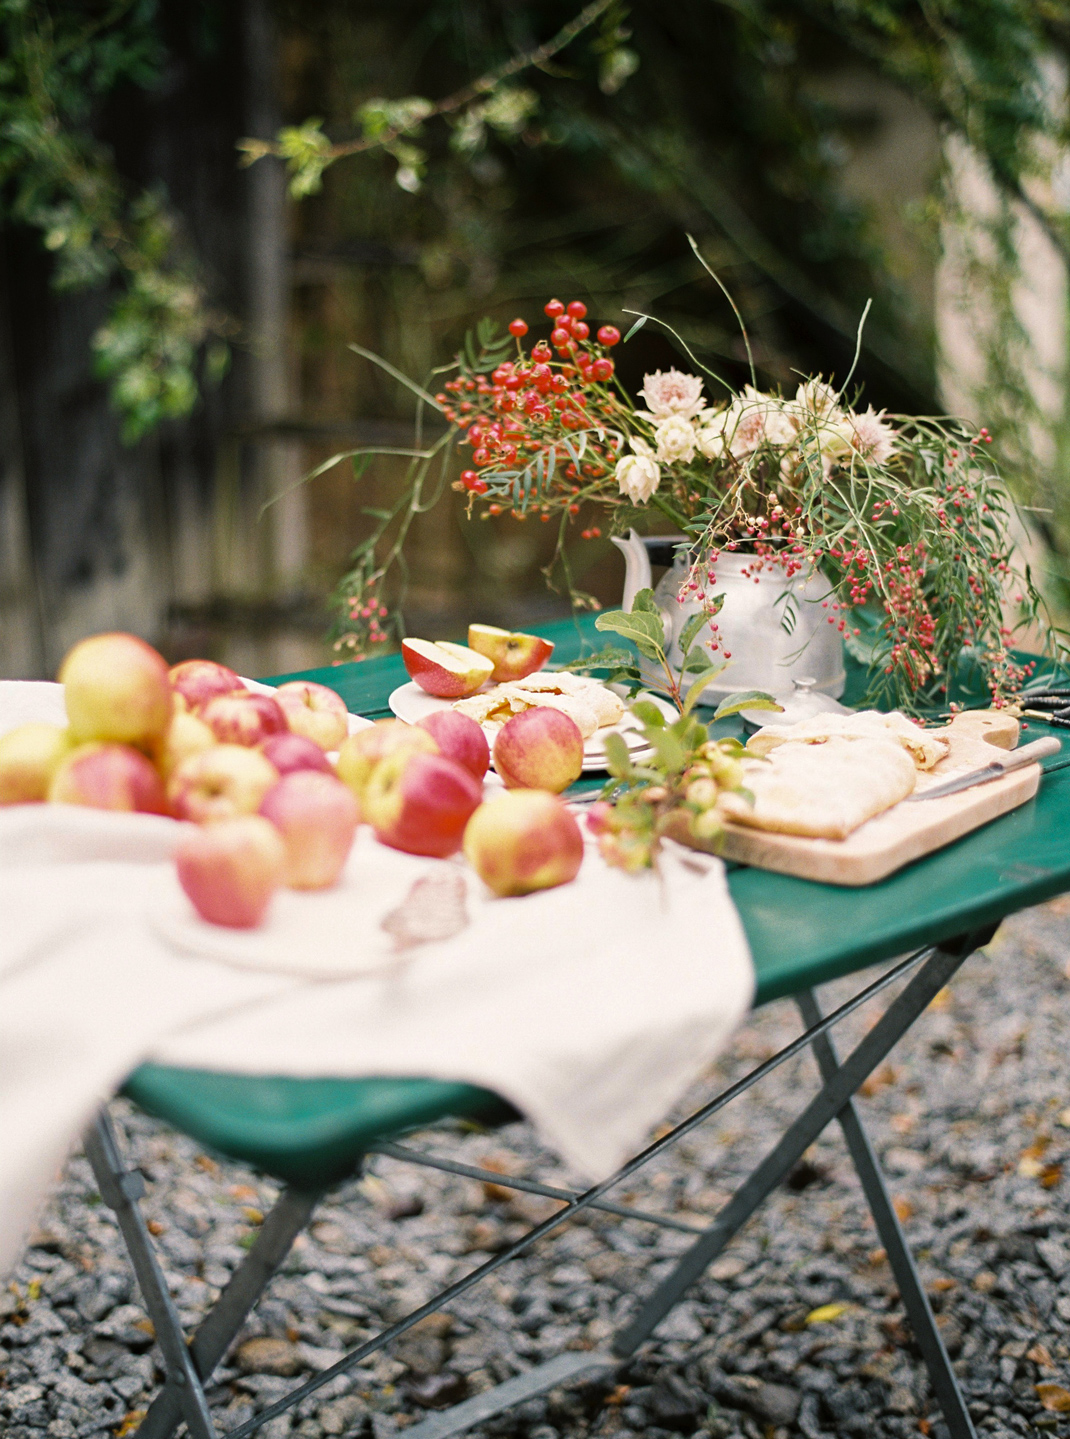 Silvia Fischer. Echte Kuchenliebe. Apfelschlangerl Rezept aus Buch